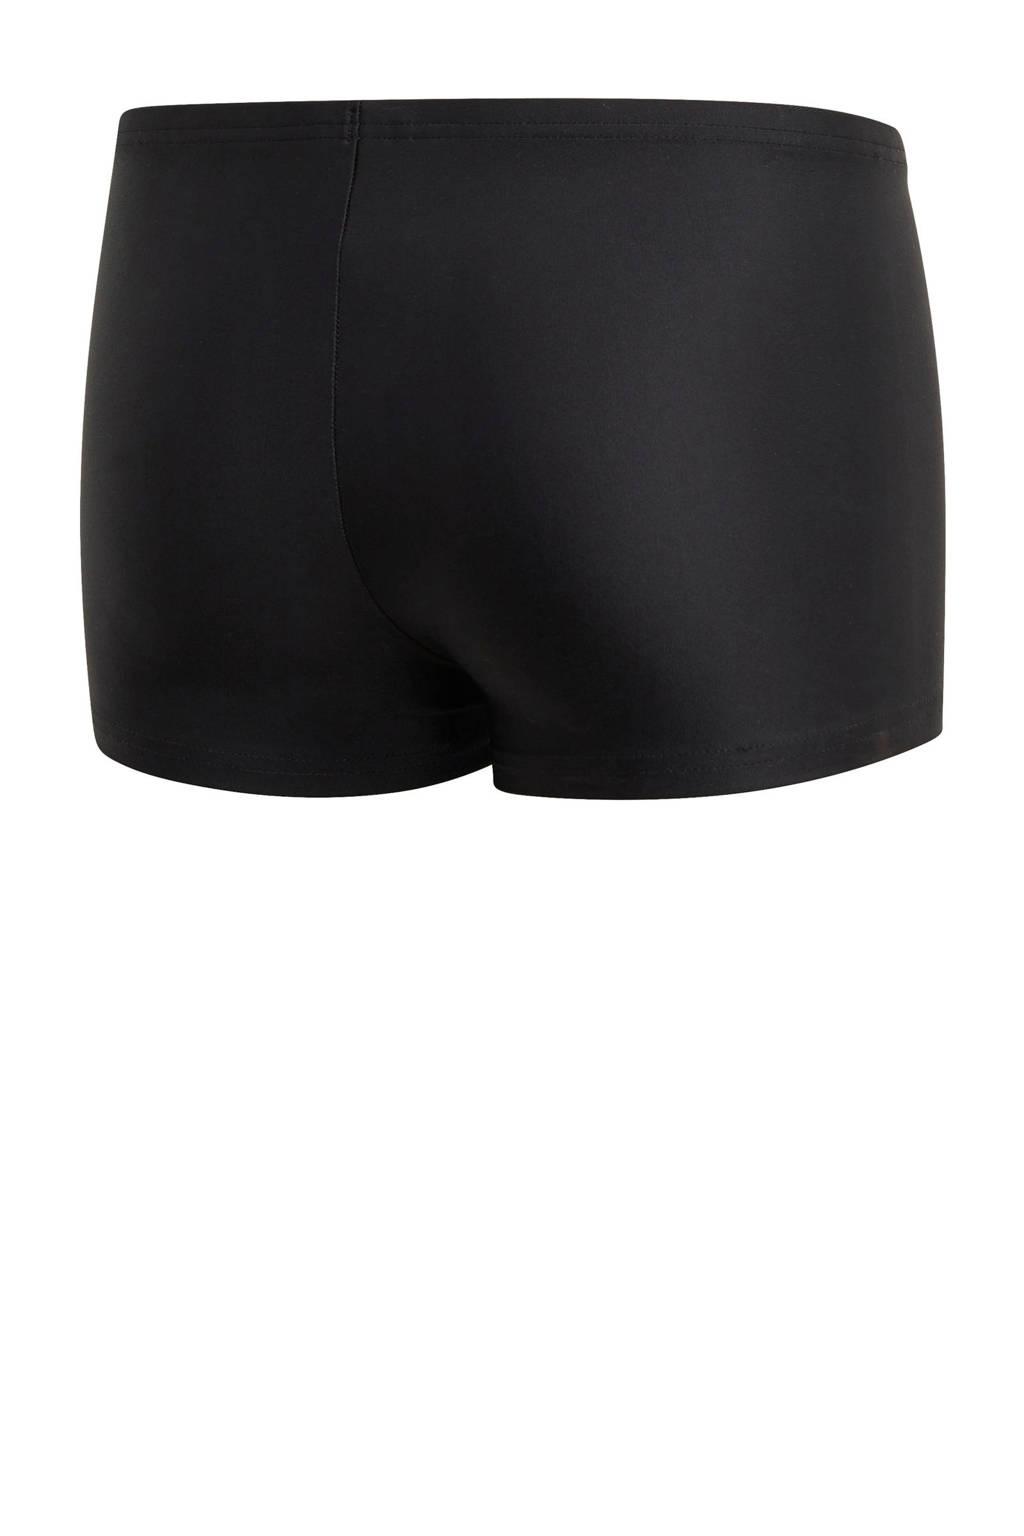 adidas Performance zwemboxer zwart, Zwart / Blauw